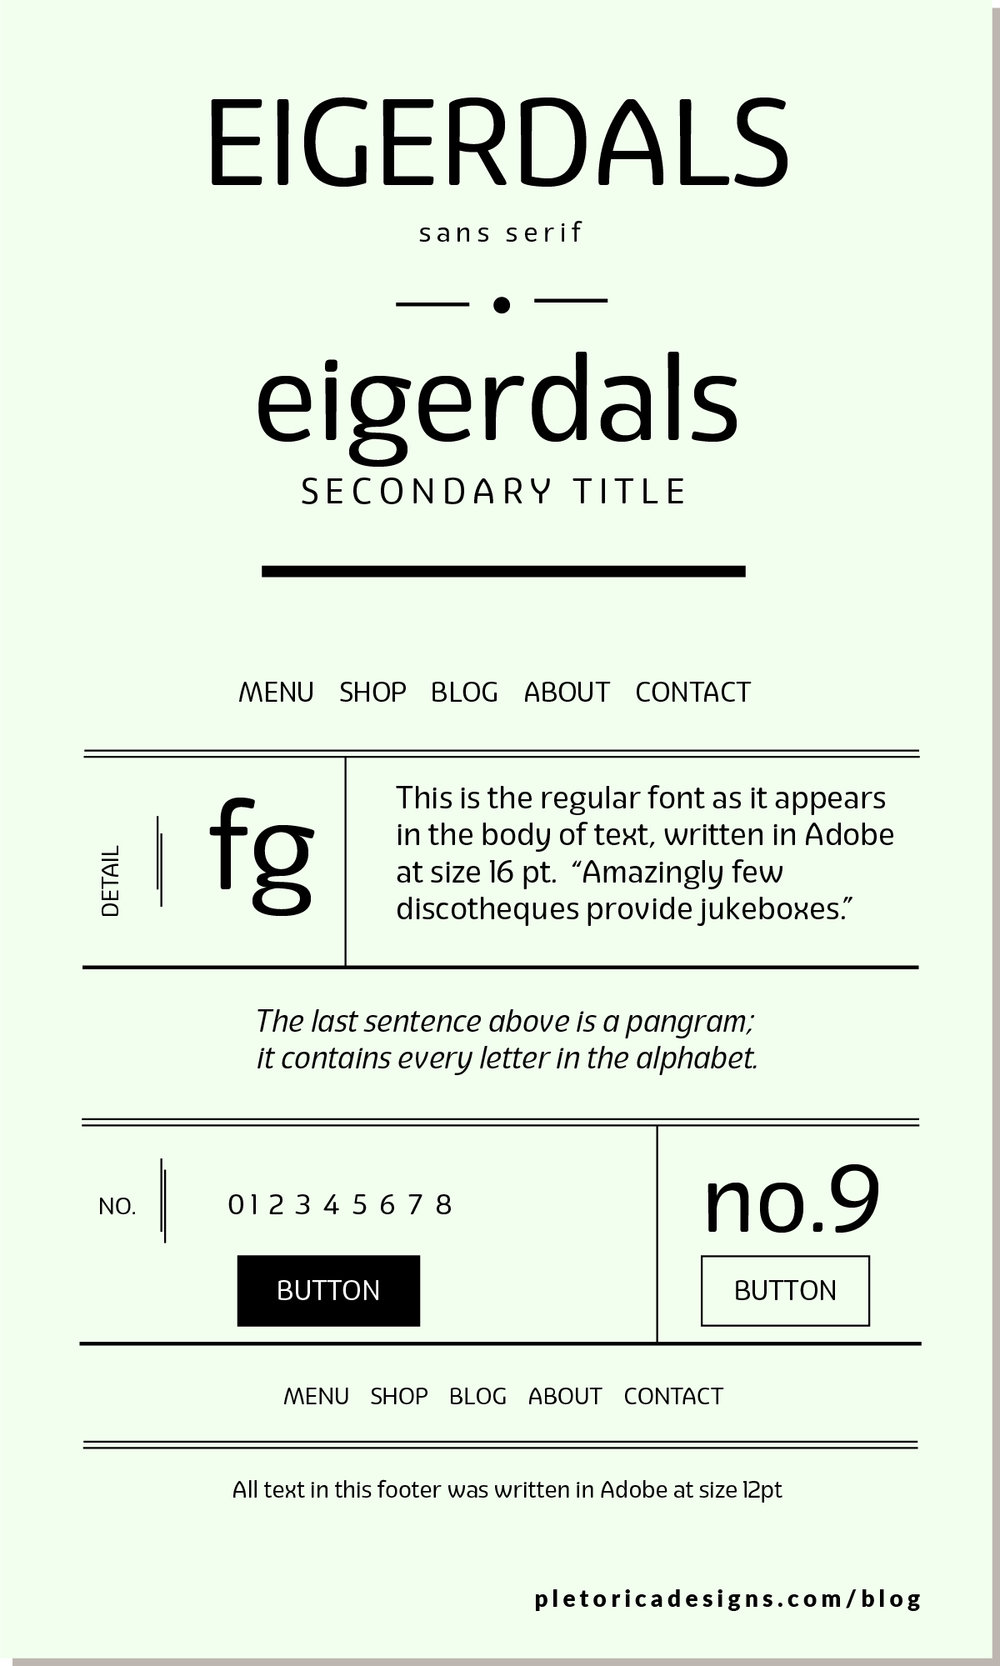 LET'S TYPE: Eigerdals — PLETÓRICA DESIGNS